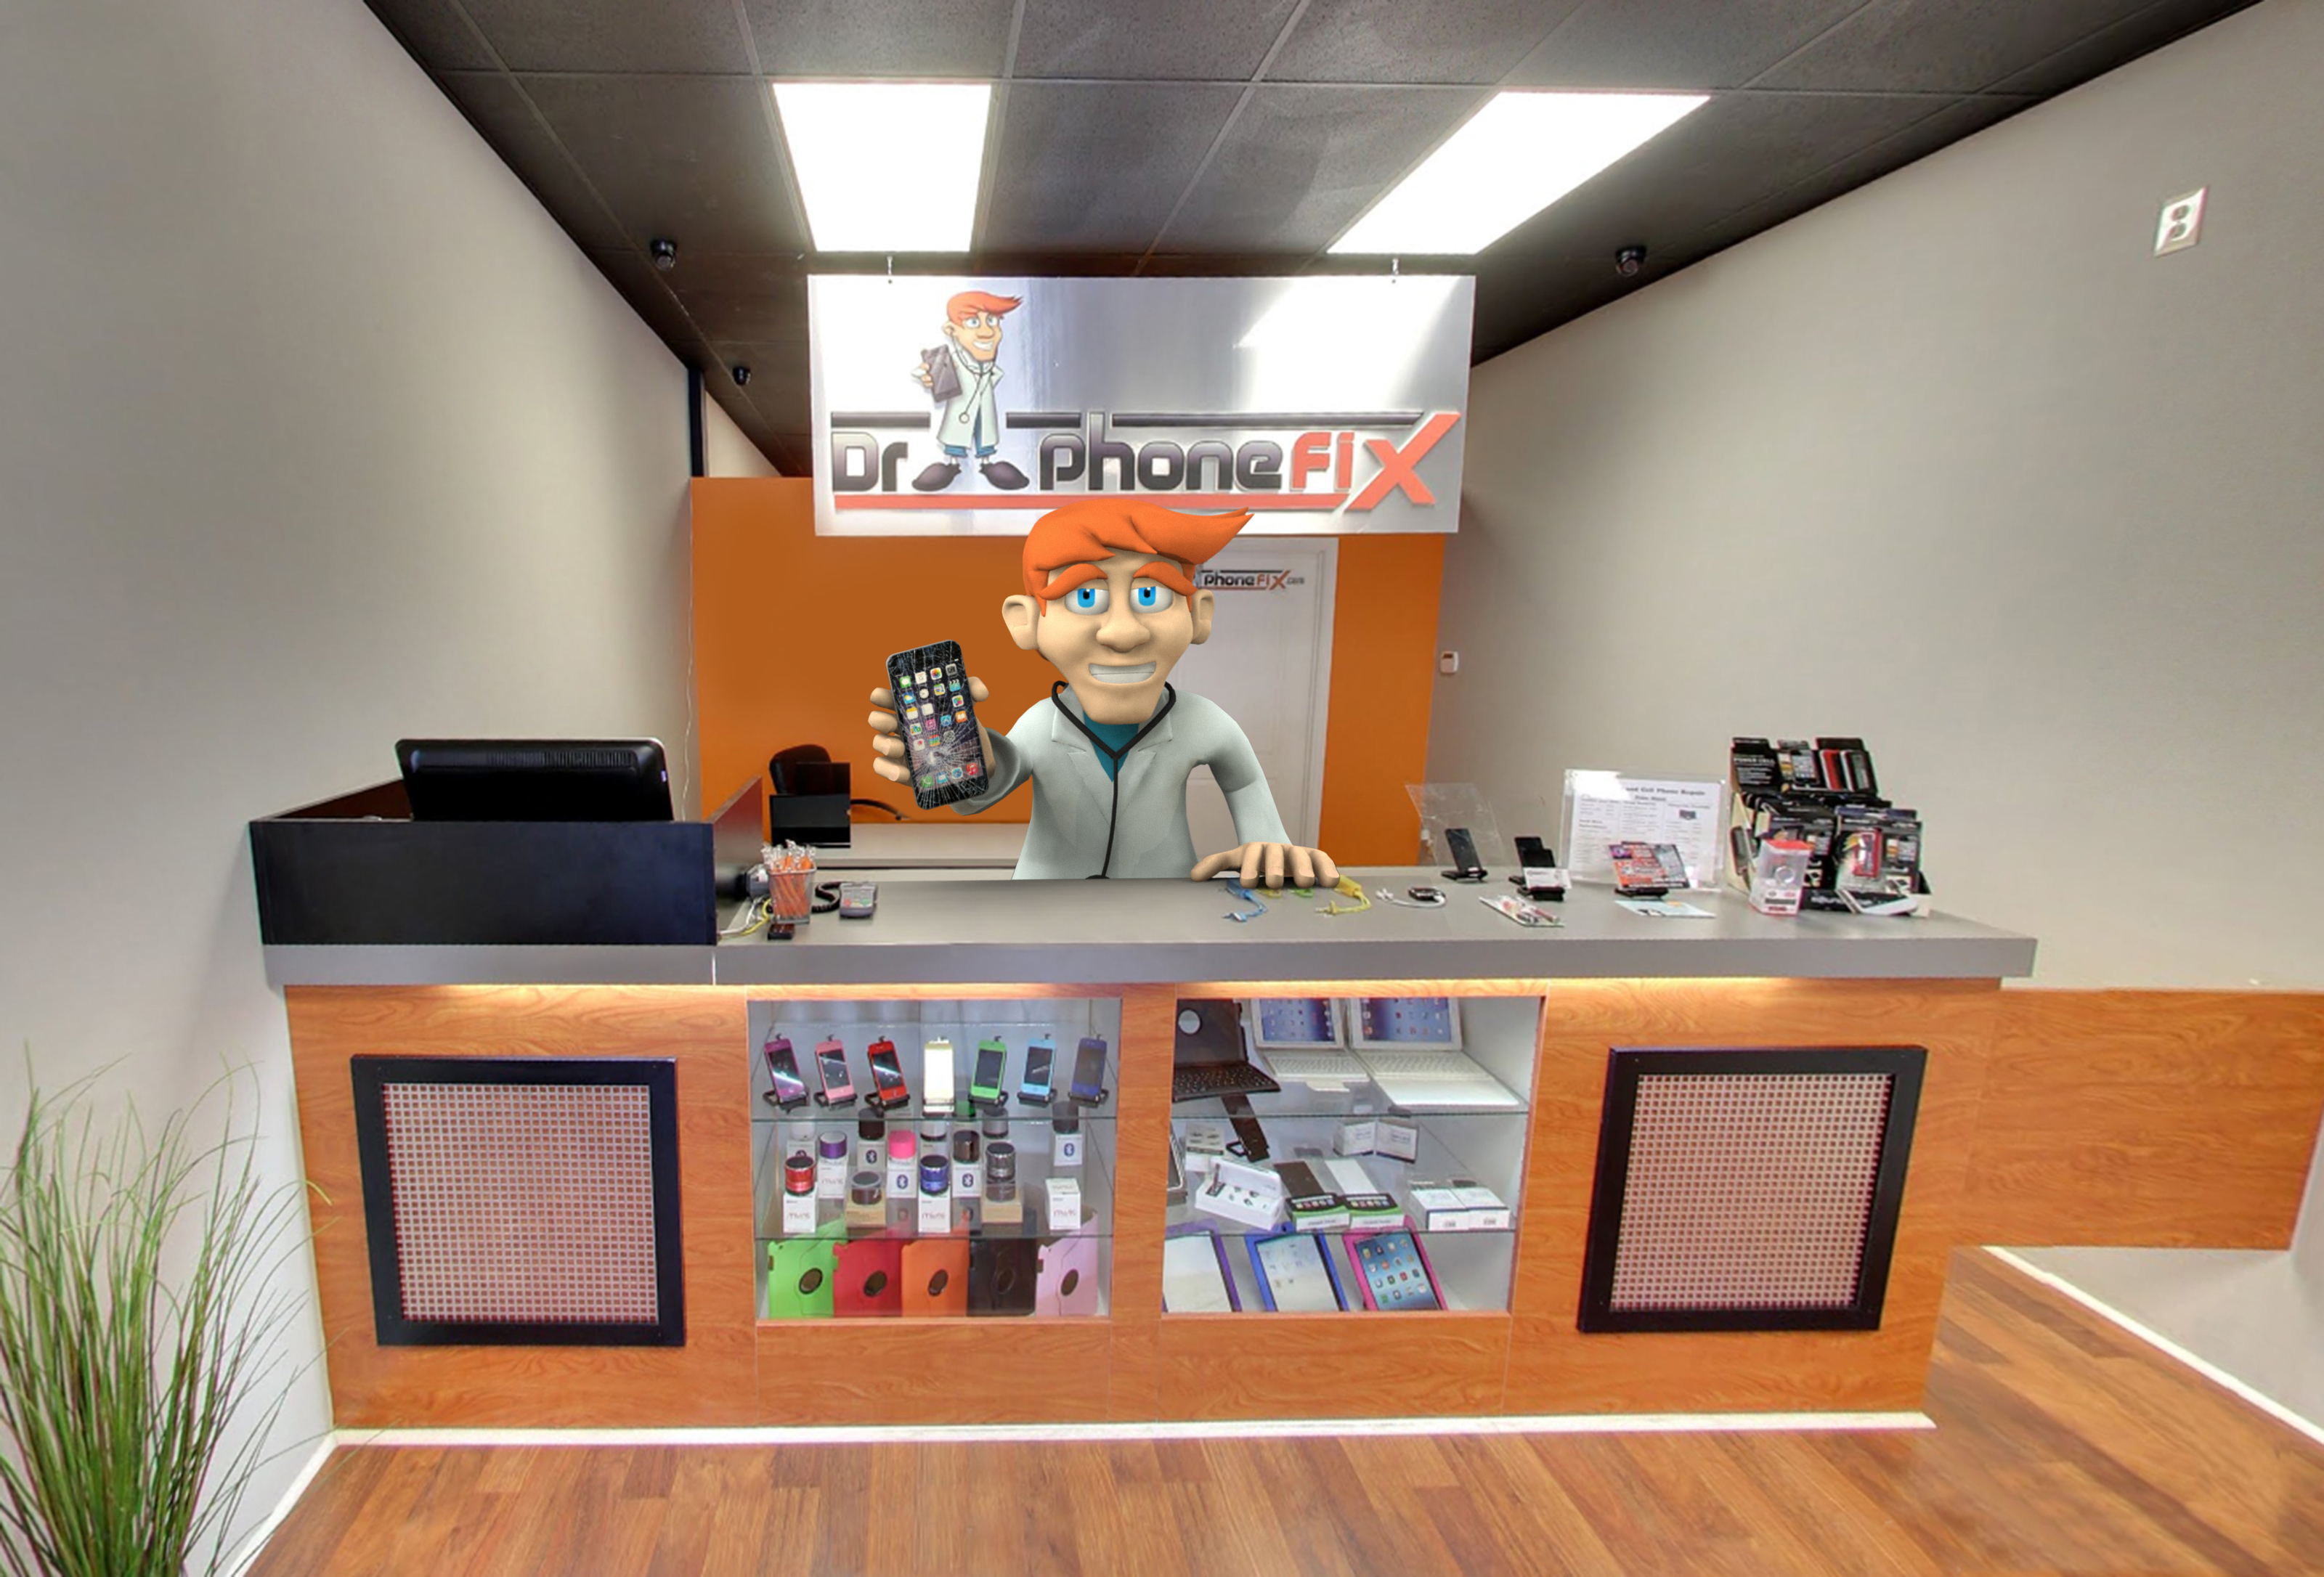 Home Design Stores Chicago Drphonefix Announces Mobile Device Repair Franchise